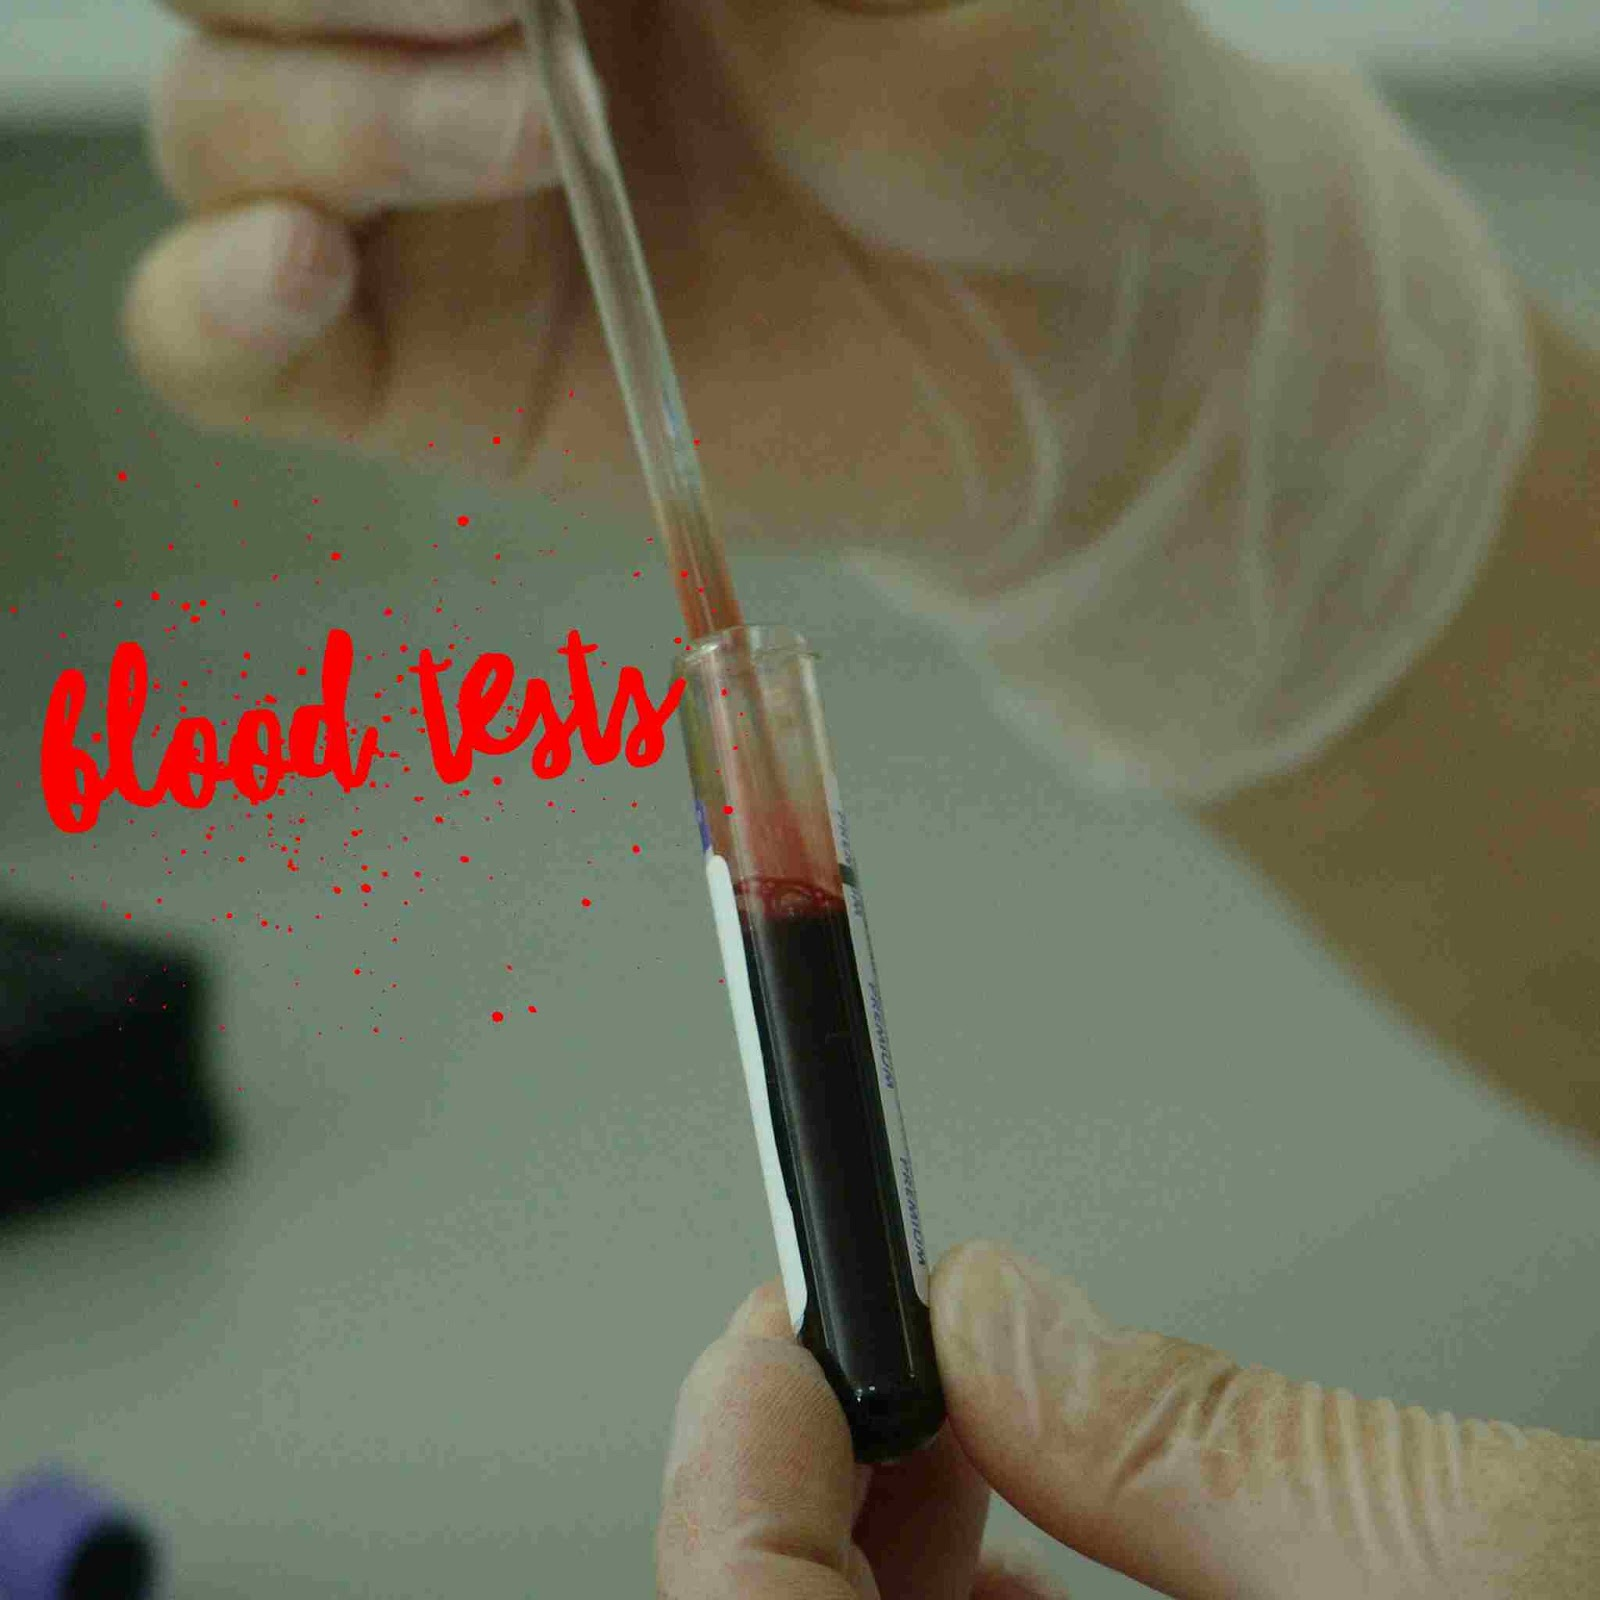 Laboratory blood studies